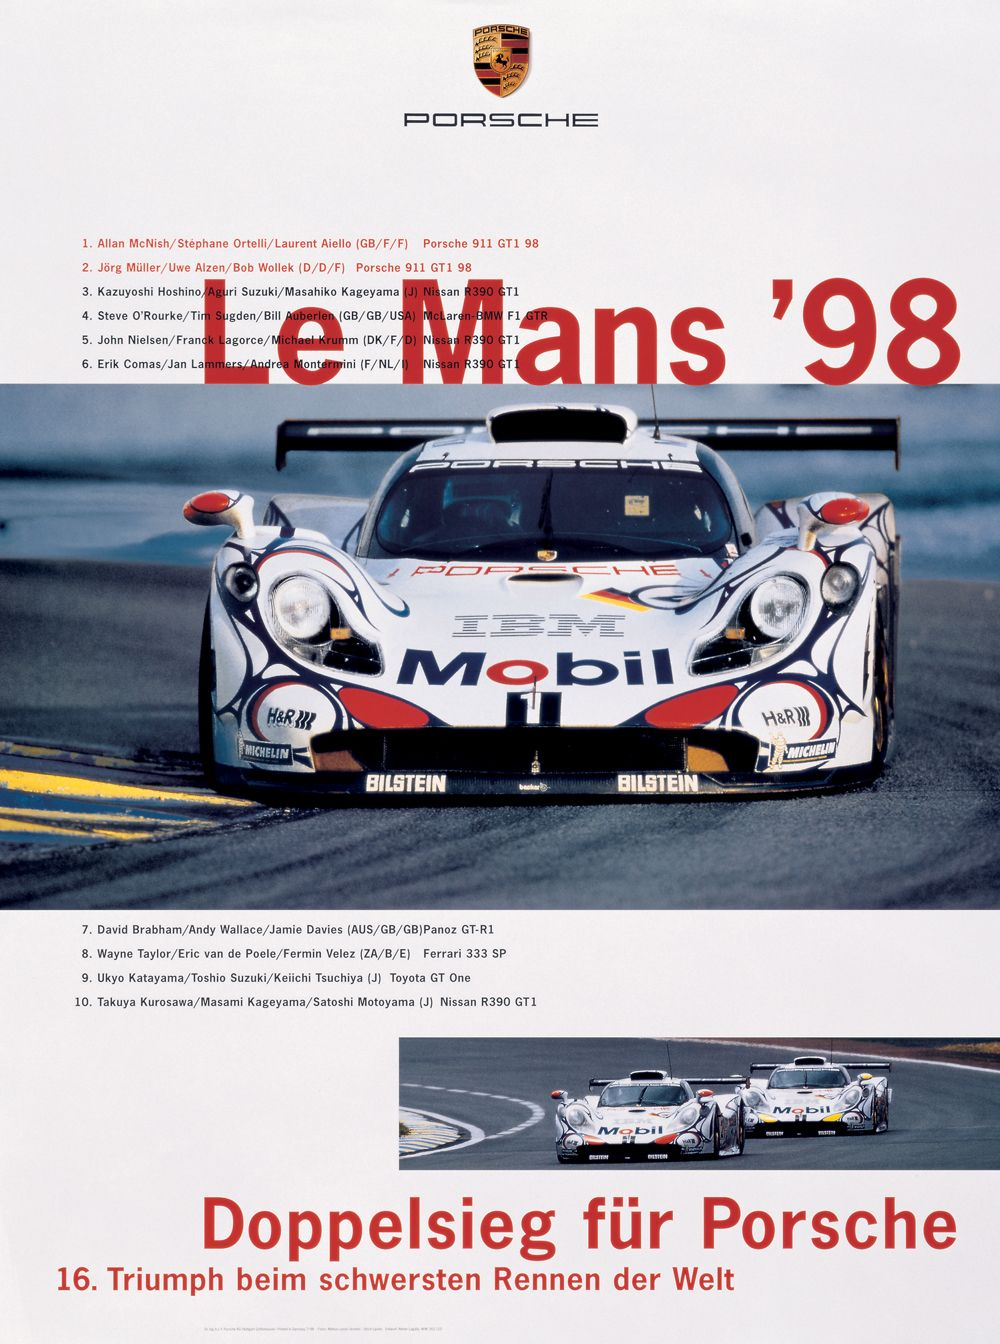 18 - PORSCHE - 24h de Le Mans 1998